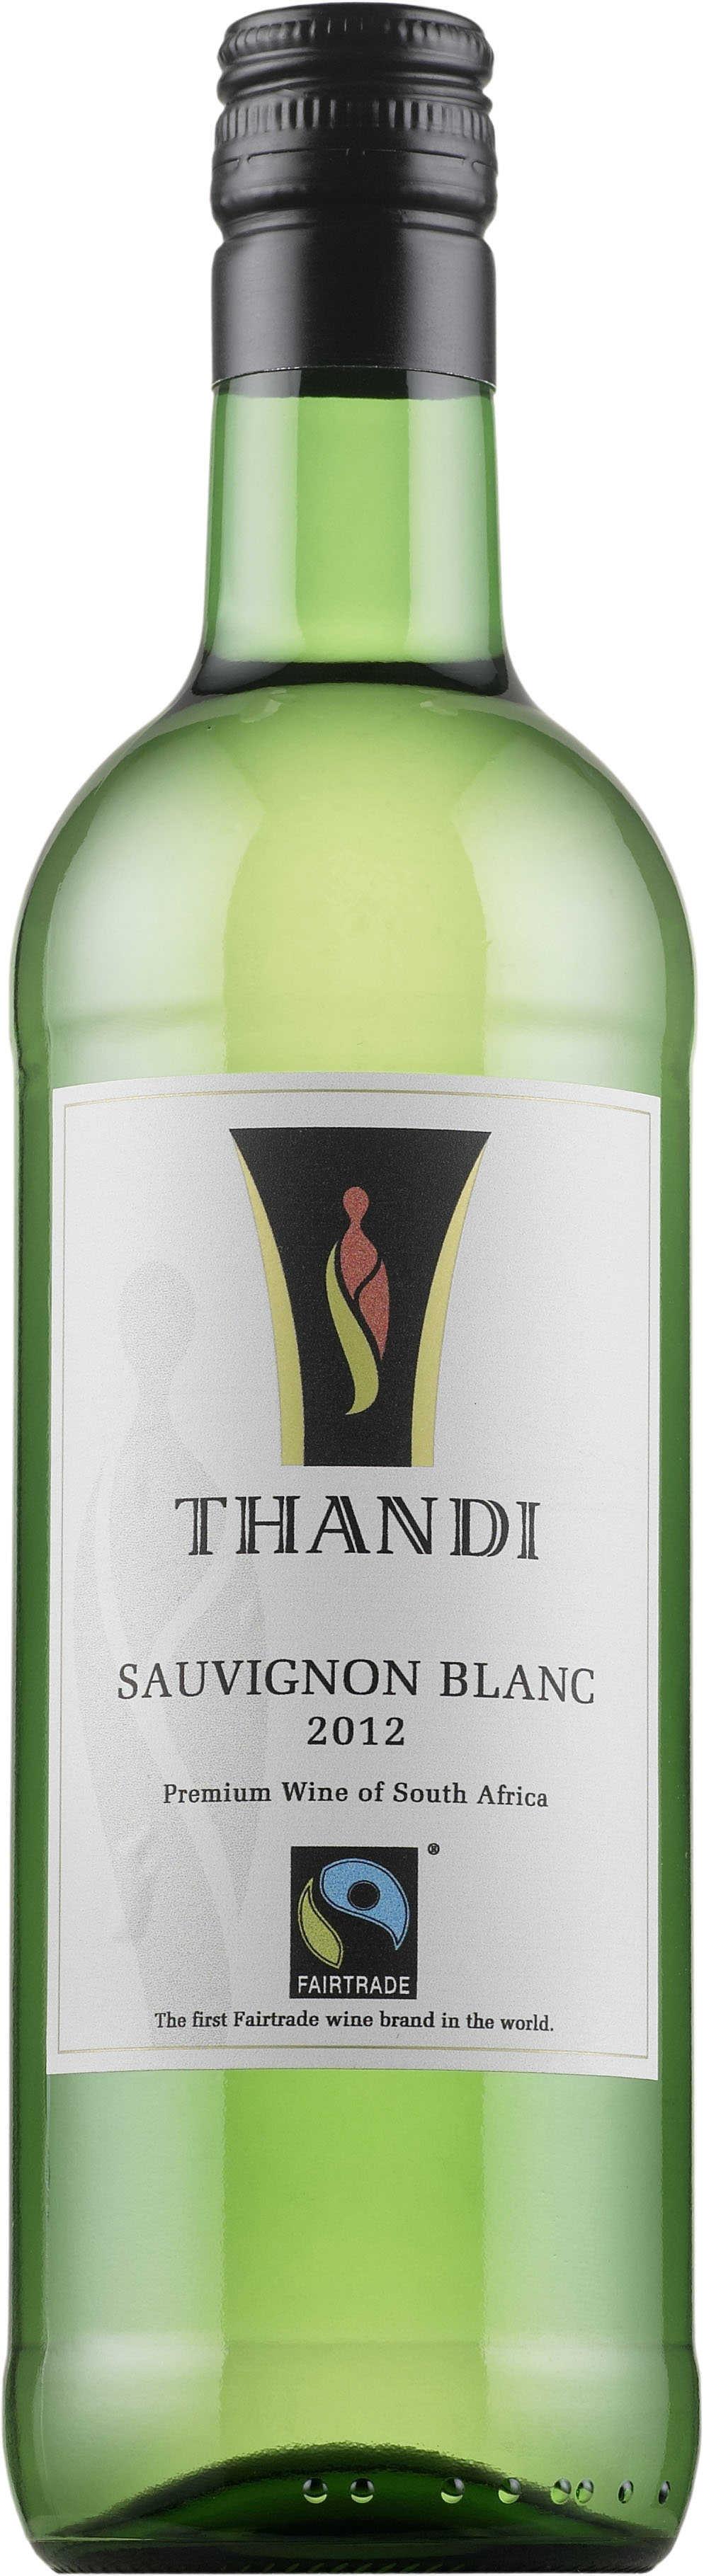 Thandi Sauvignon Blanc